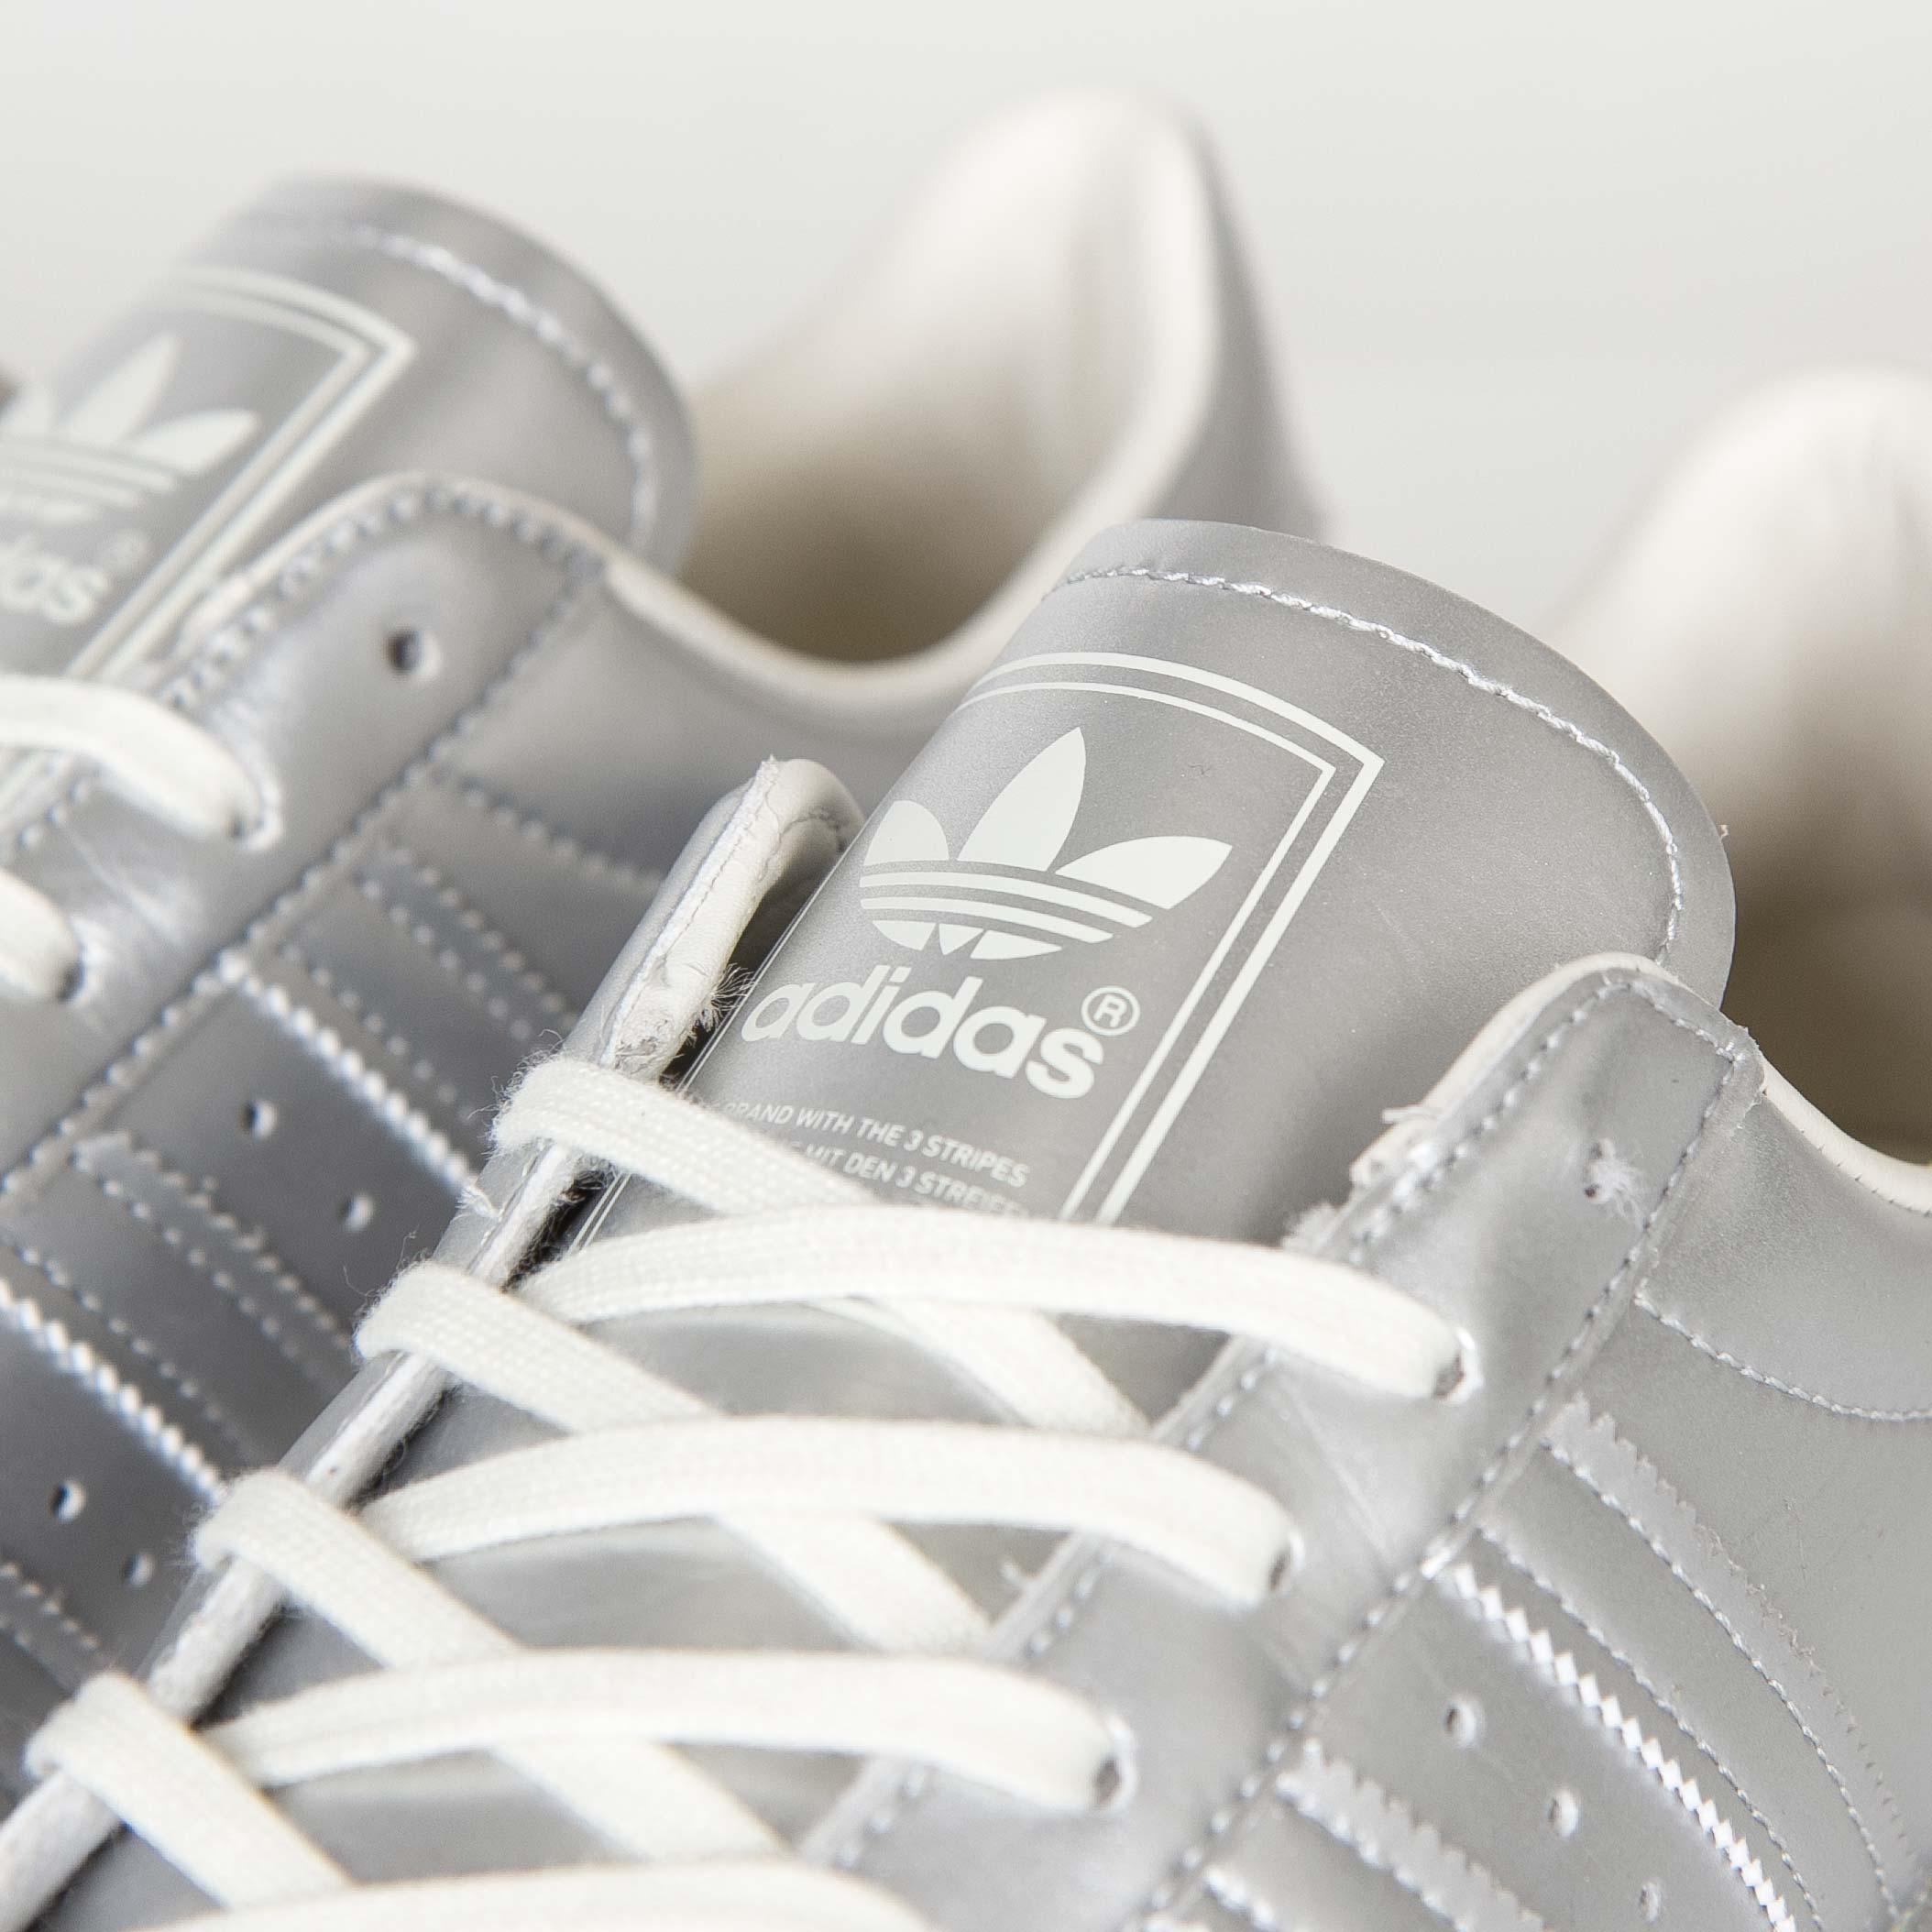 c07fb3a35ed adidas Superstar 80s Metallic Pack - S82741 - Sneakersnstuff ...